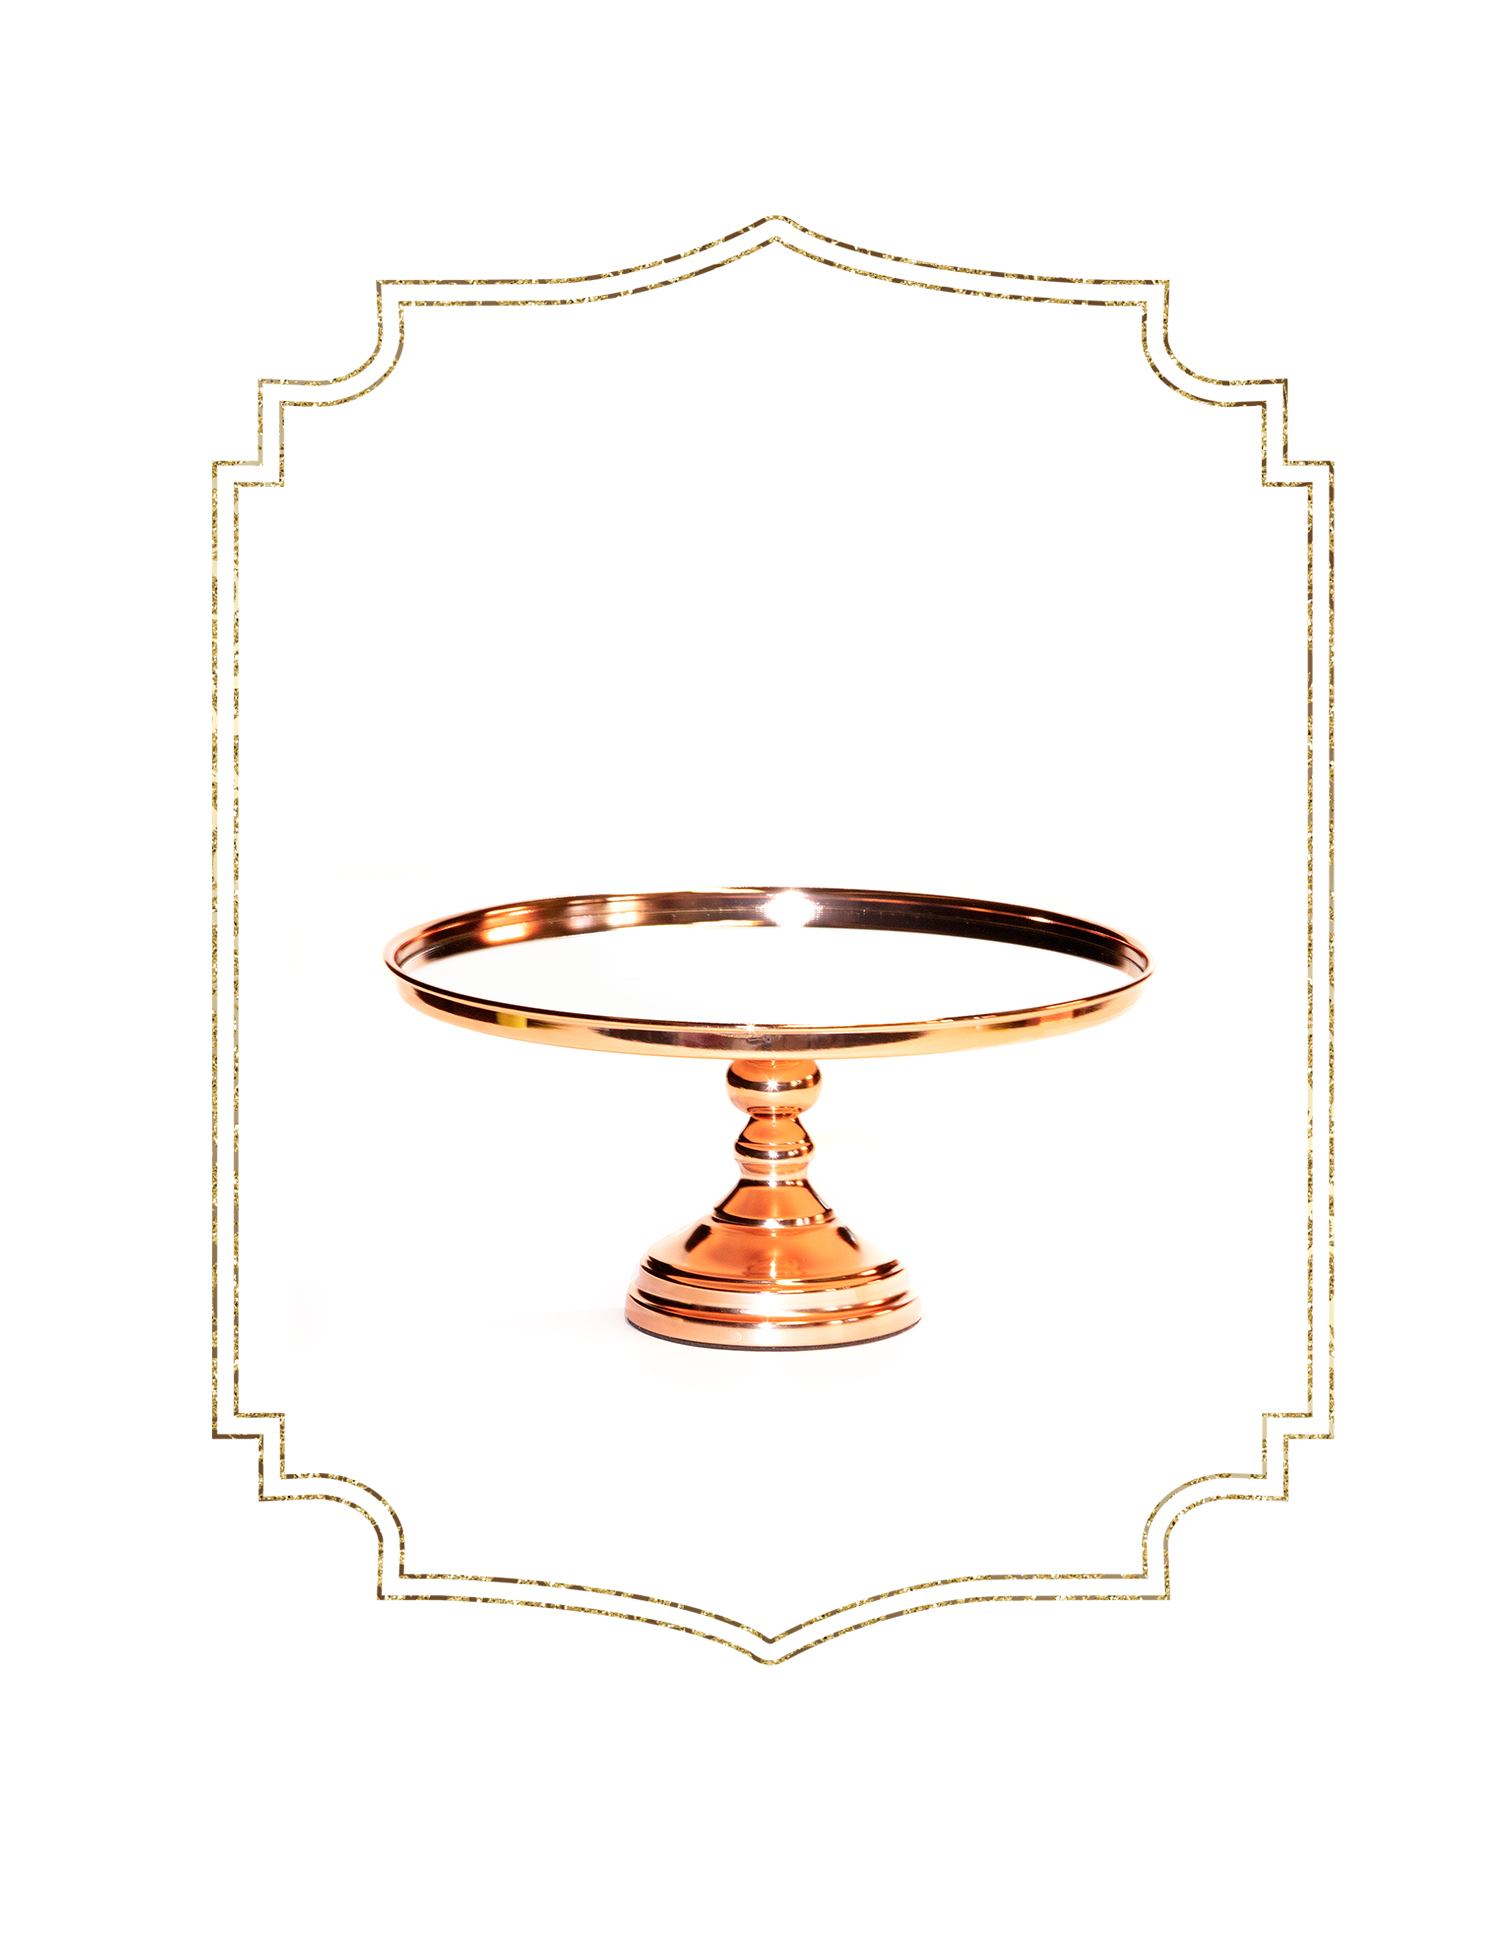 SHOP-preview 12%22 mirror top cakestand__1676SR.jpg